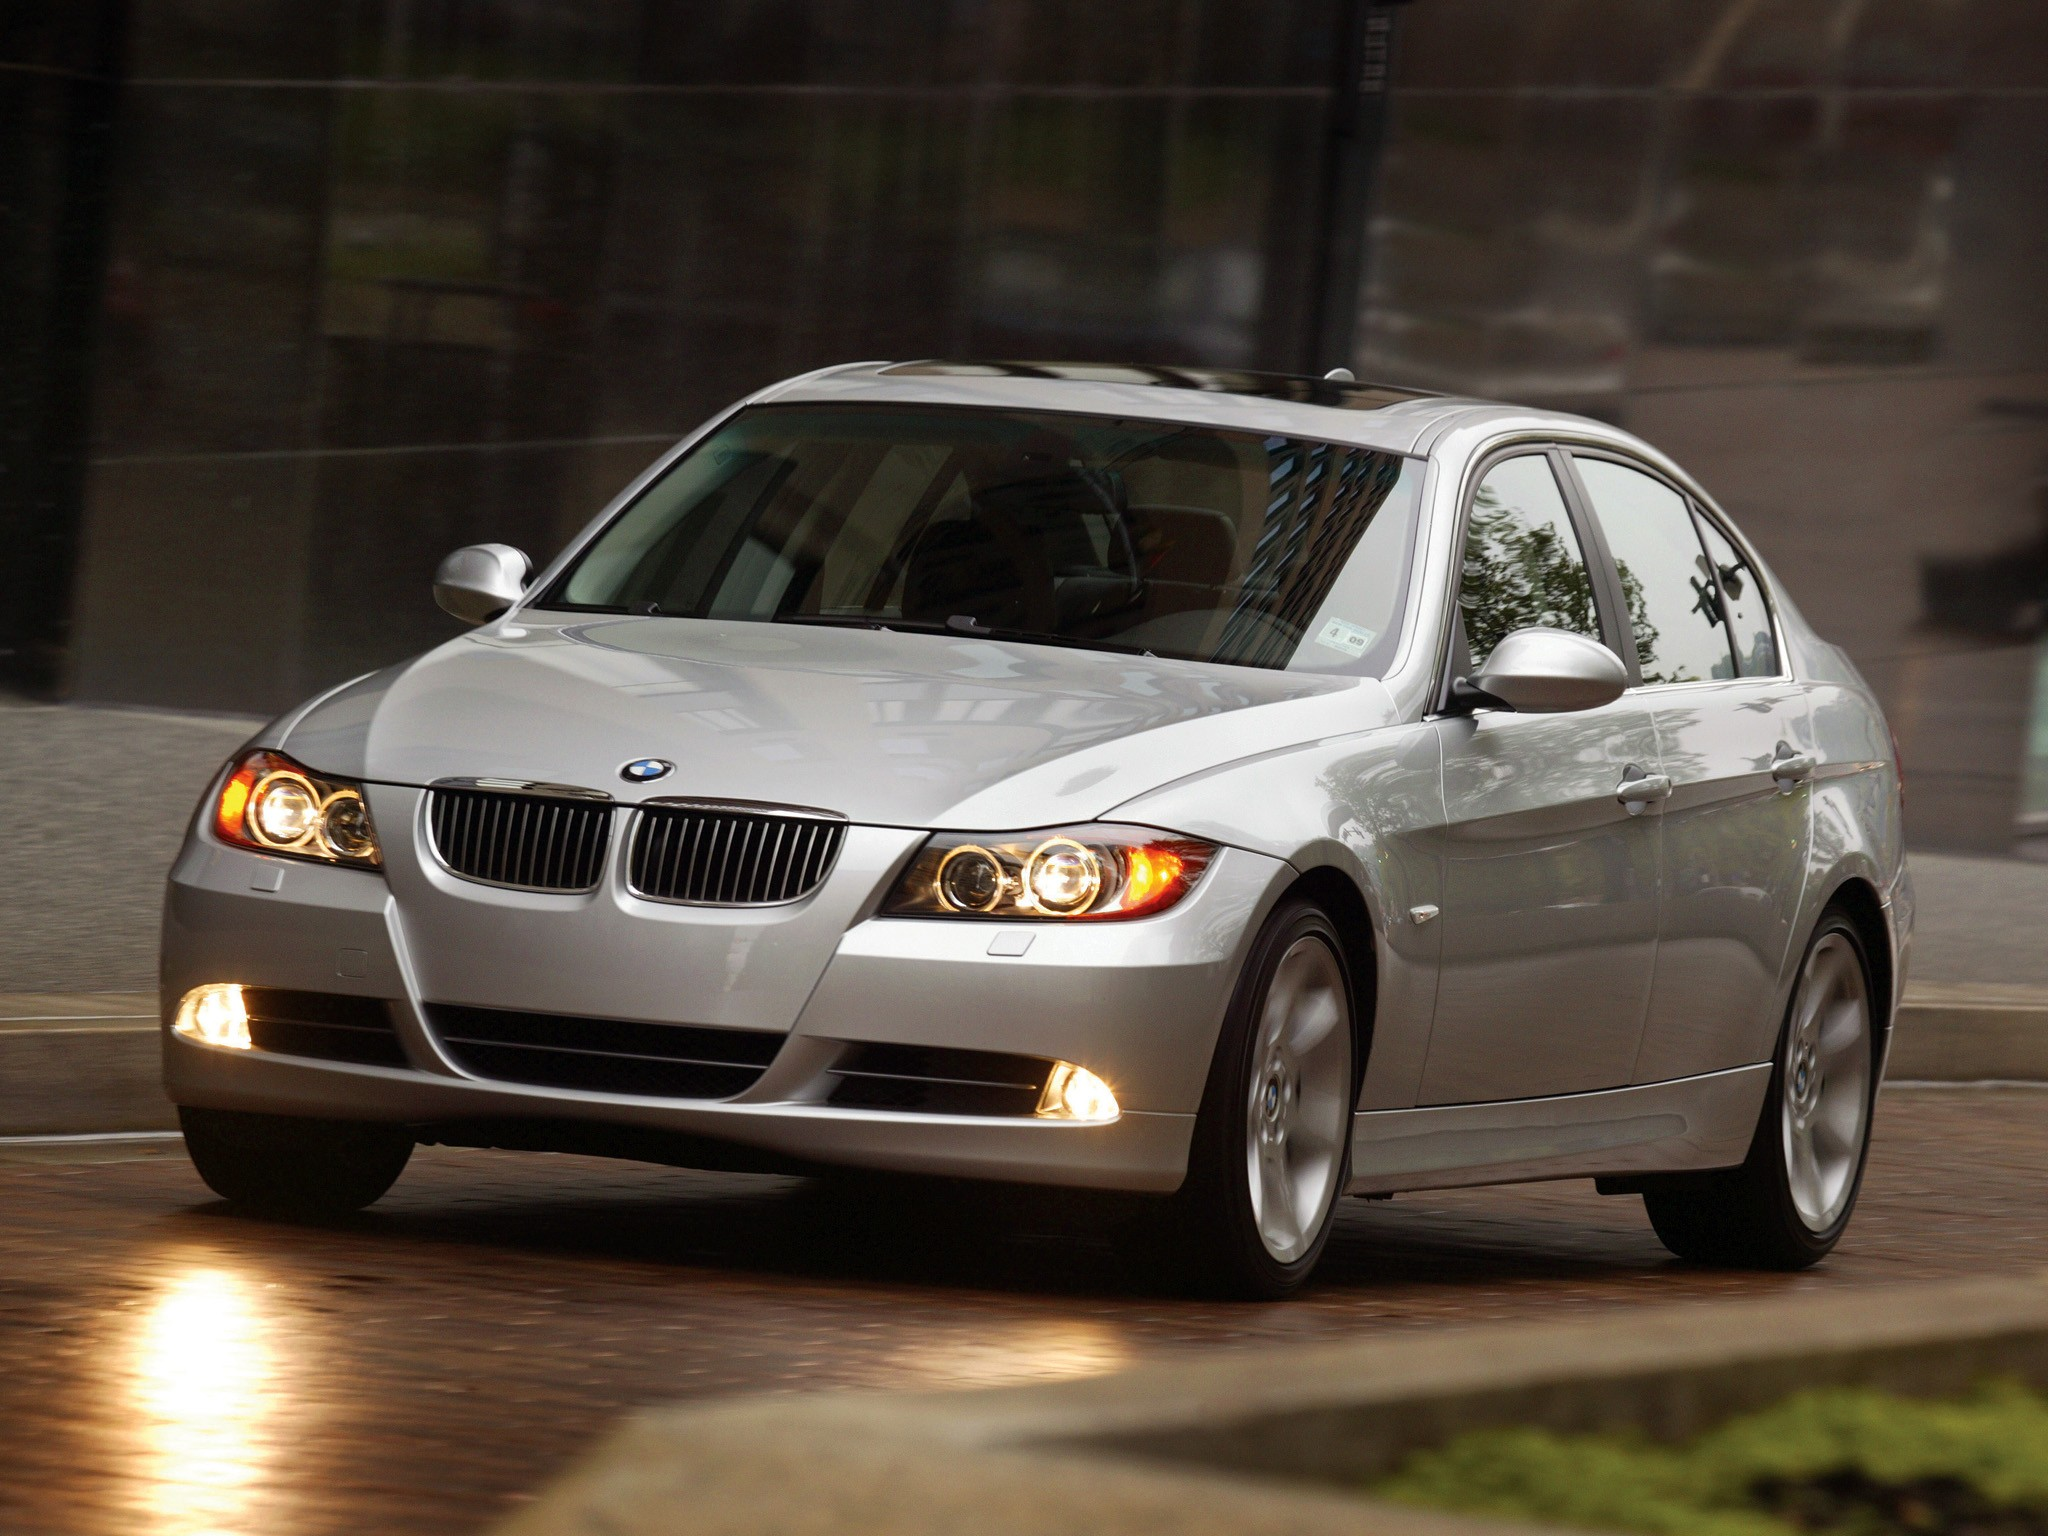 Bmw E90 Performance Bumper >> BMW 3 Series (E90) specs - 2005, 2006, 2007, 2008 - autoevolution